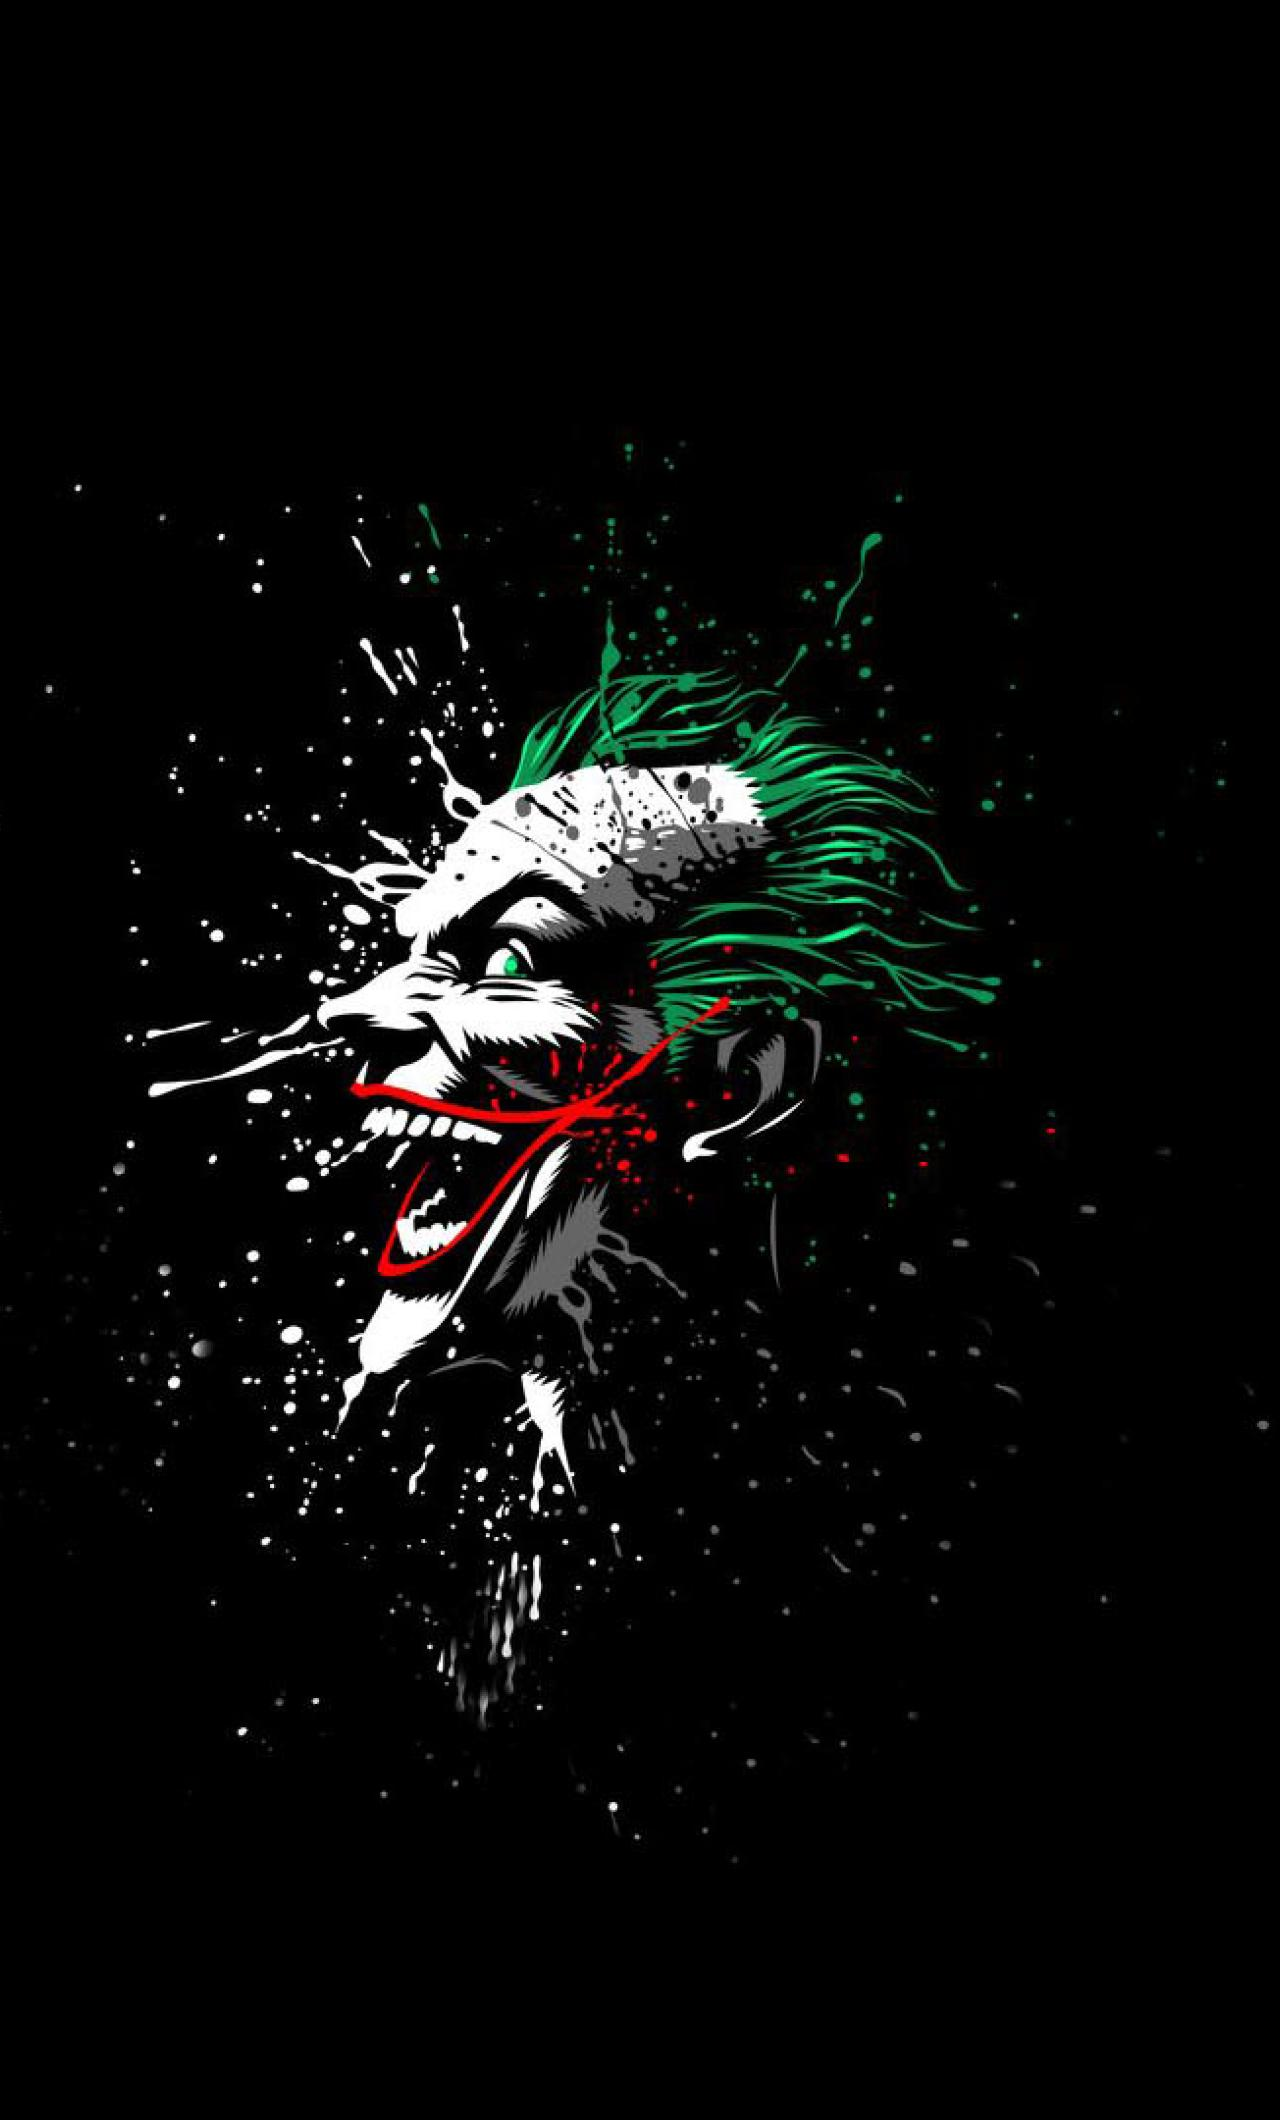 Wallpaper Of Joker Posted By Ryan Mercado